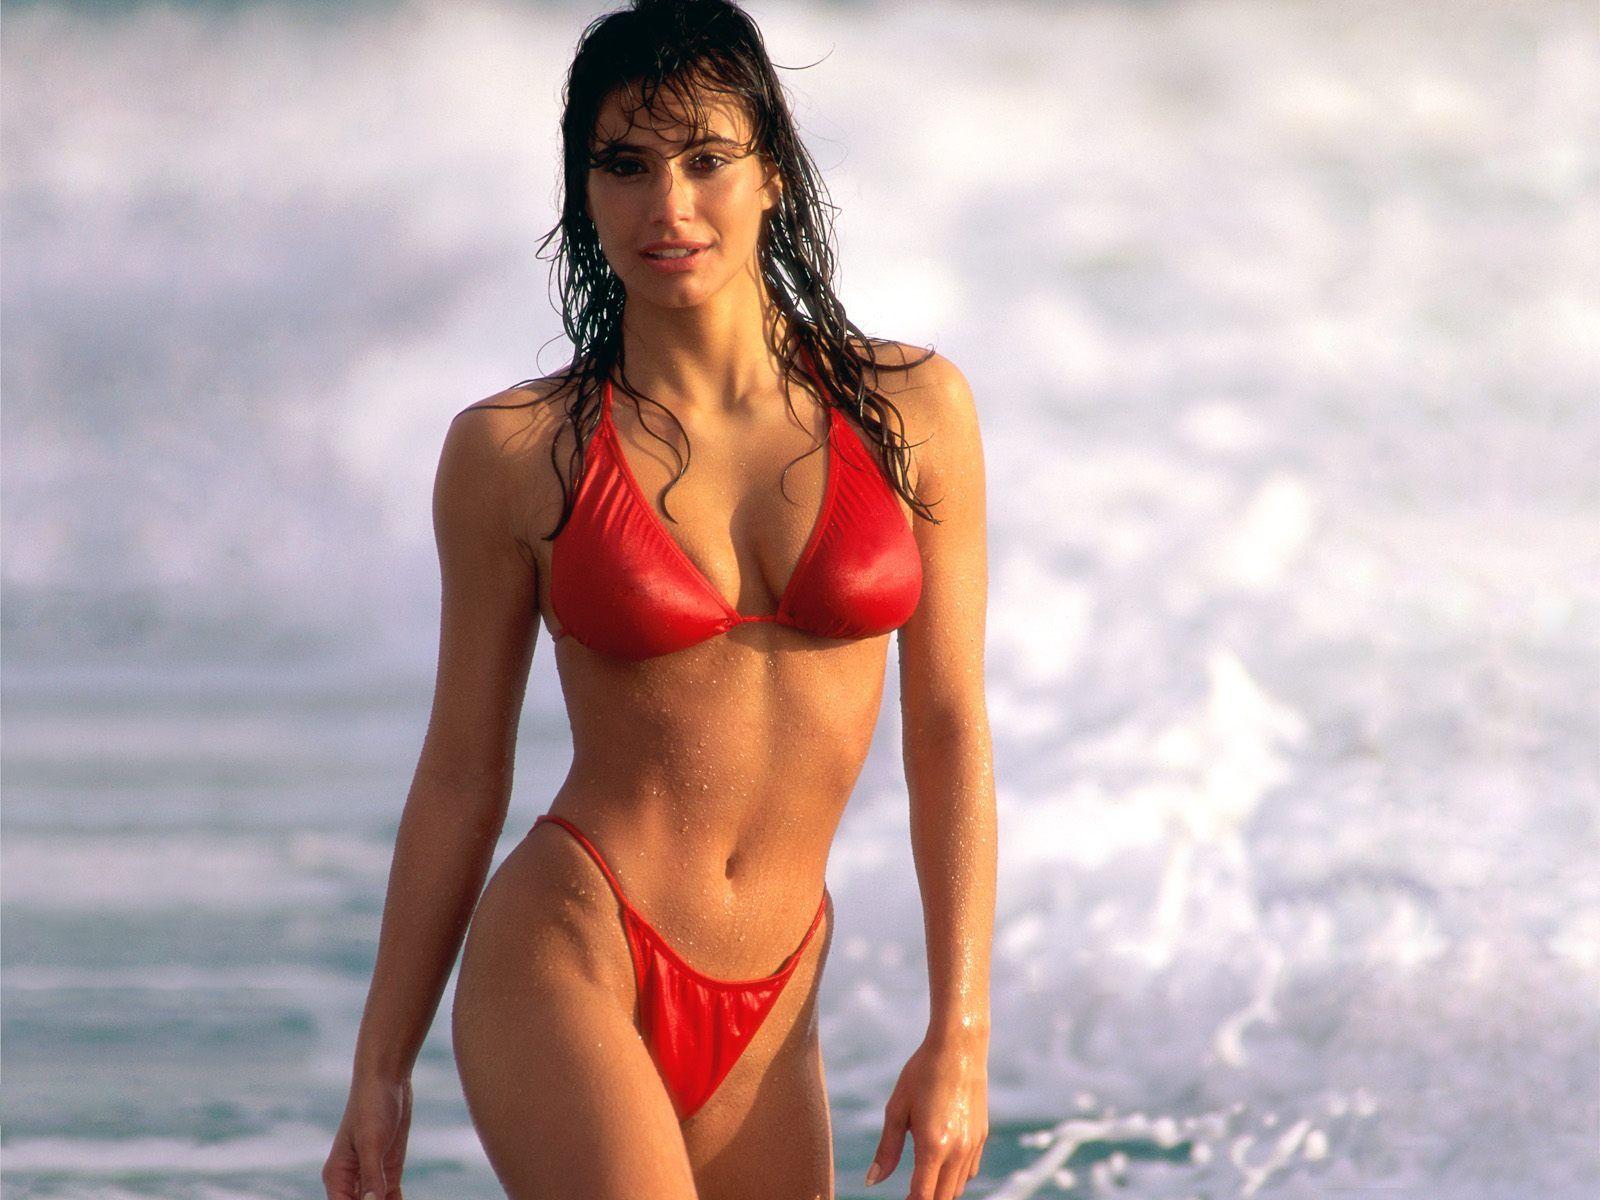 Nadia Bjorlin Bikini Hot Babes Girls Wallpaper For Celebrity Desktop Wallpaper